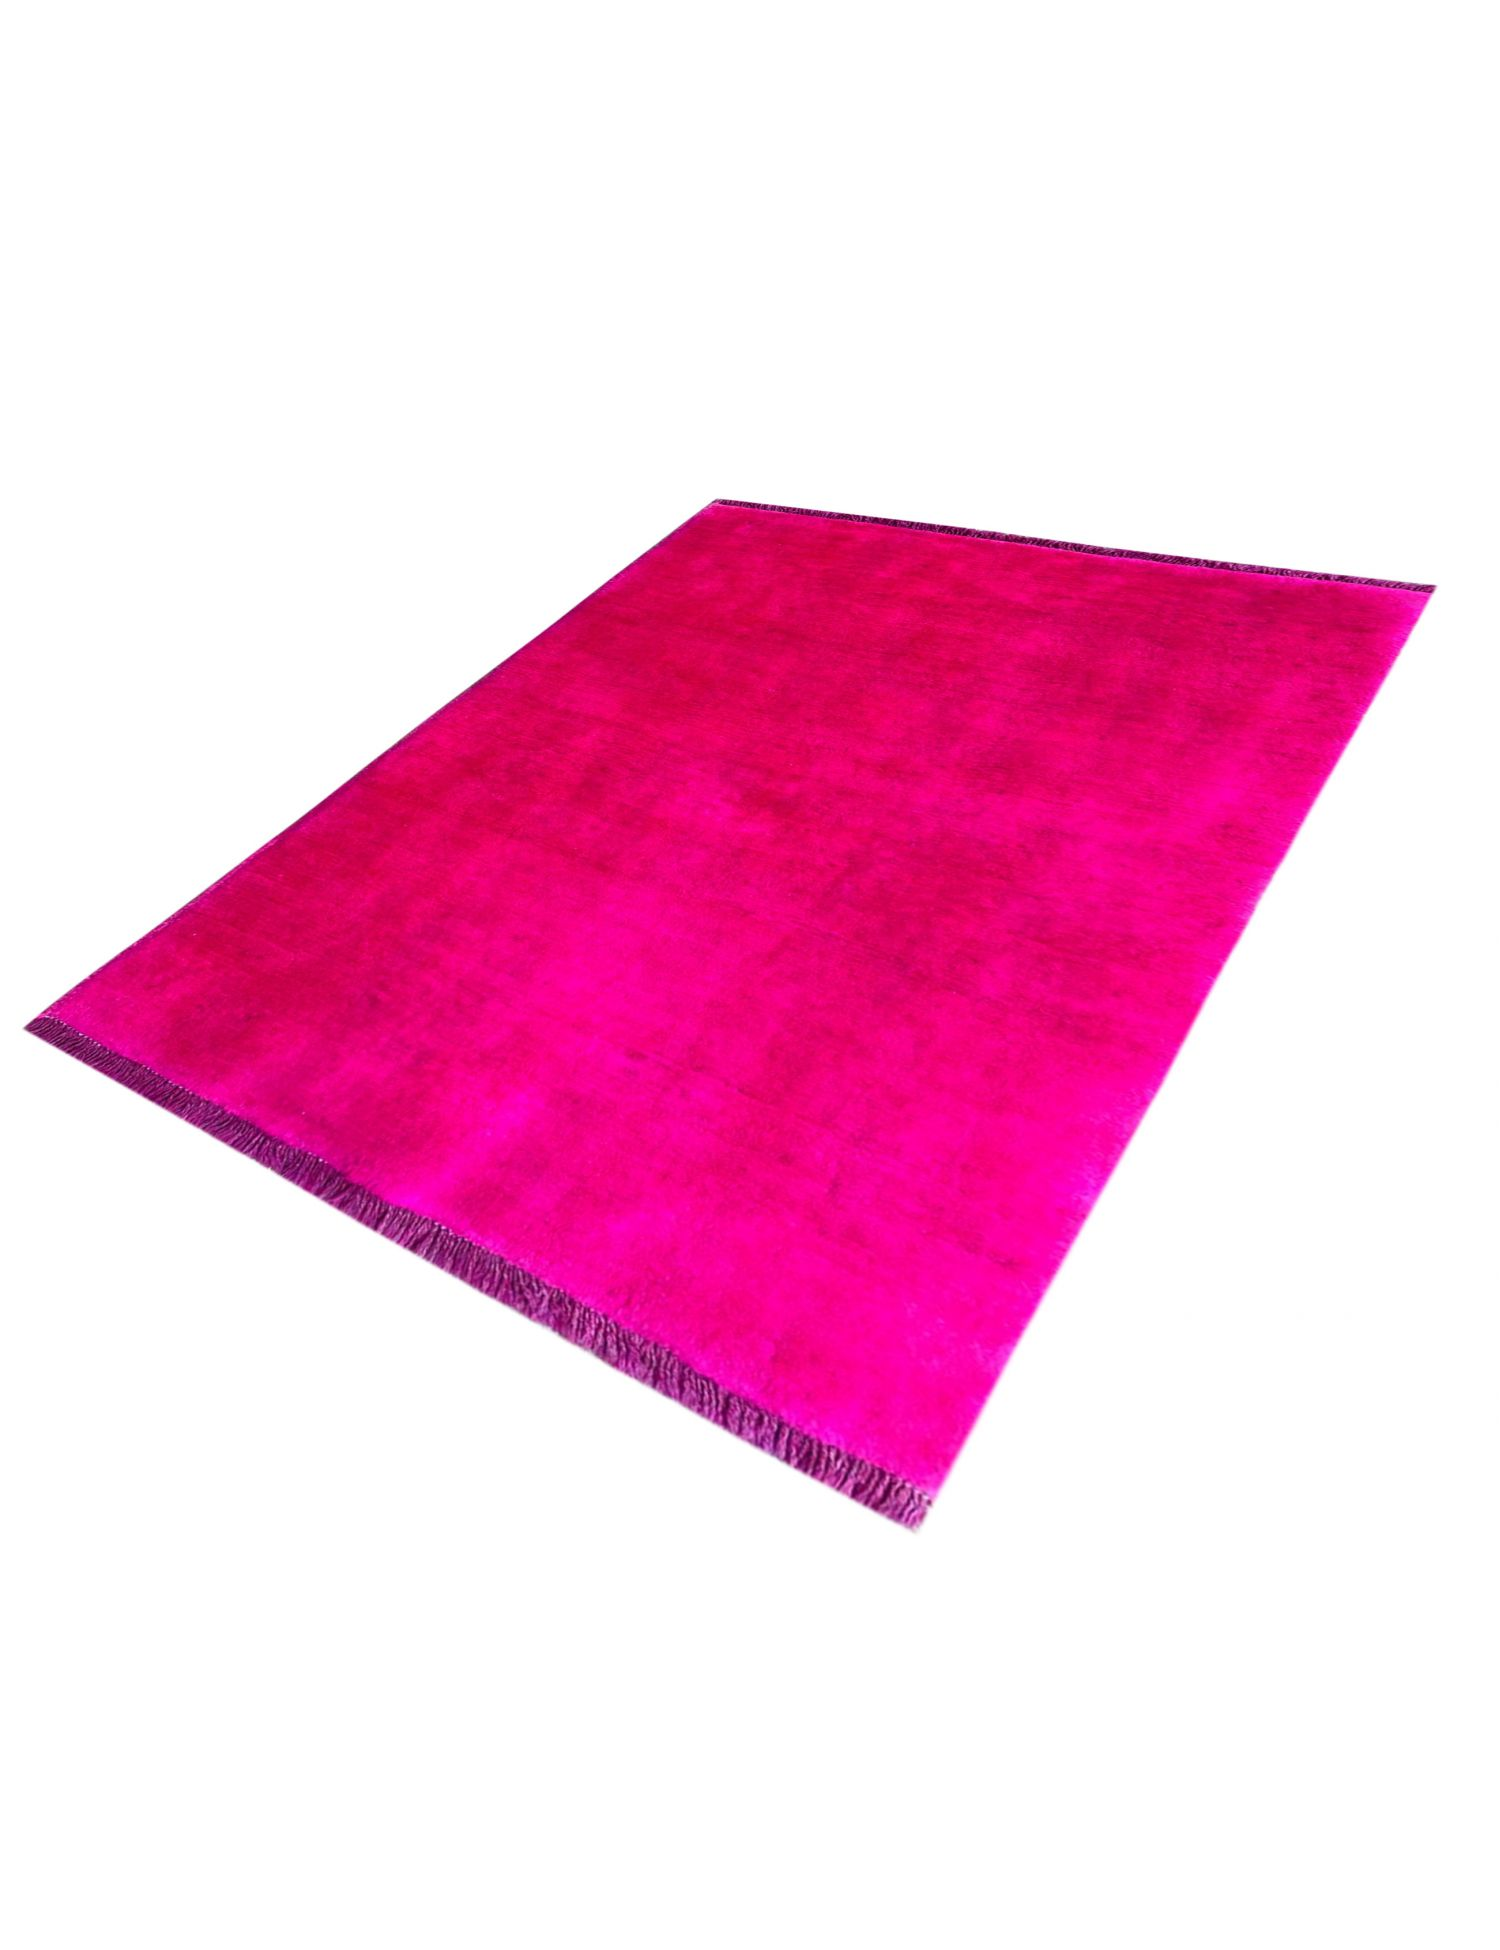 Moderne Teppiche rosa <br/>118 x 80 cm